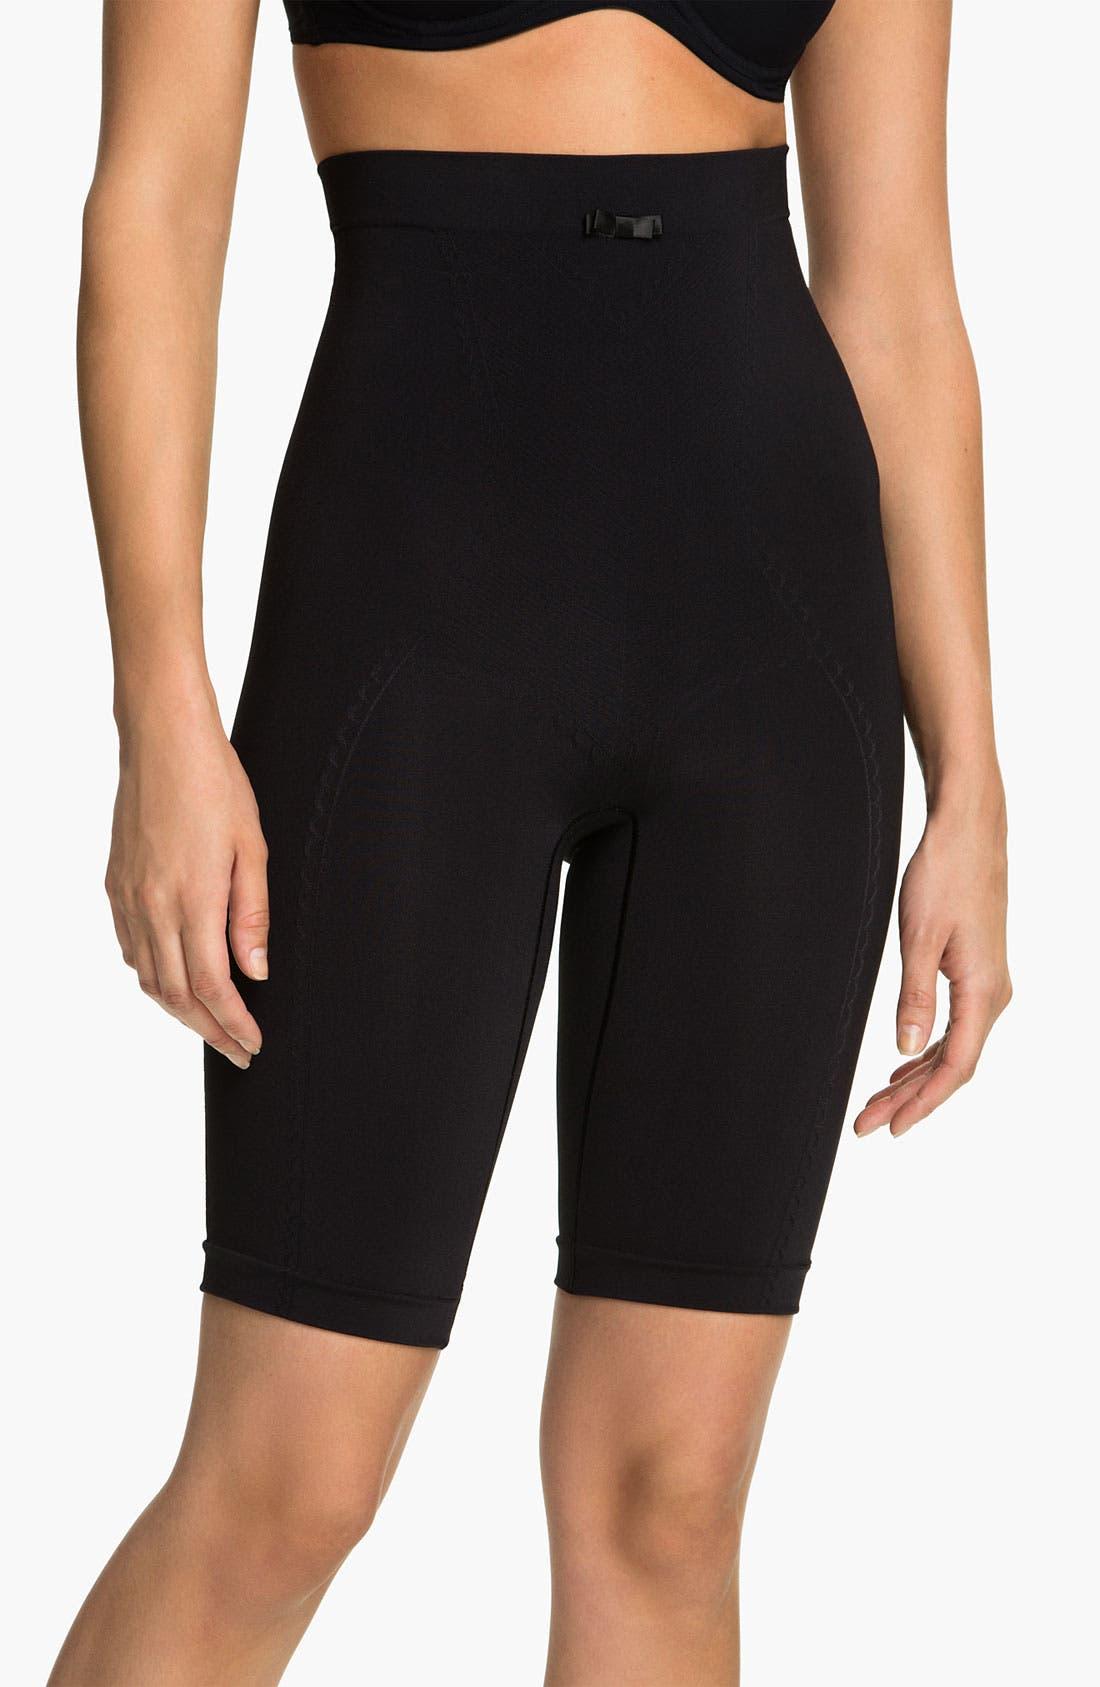 Alternate Image 1 Selected - La Perla Mid Thigh Control Shaper